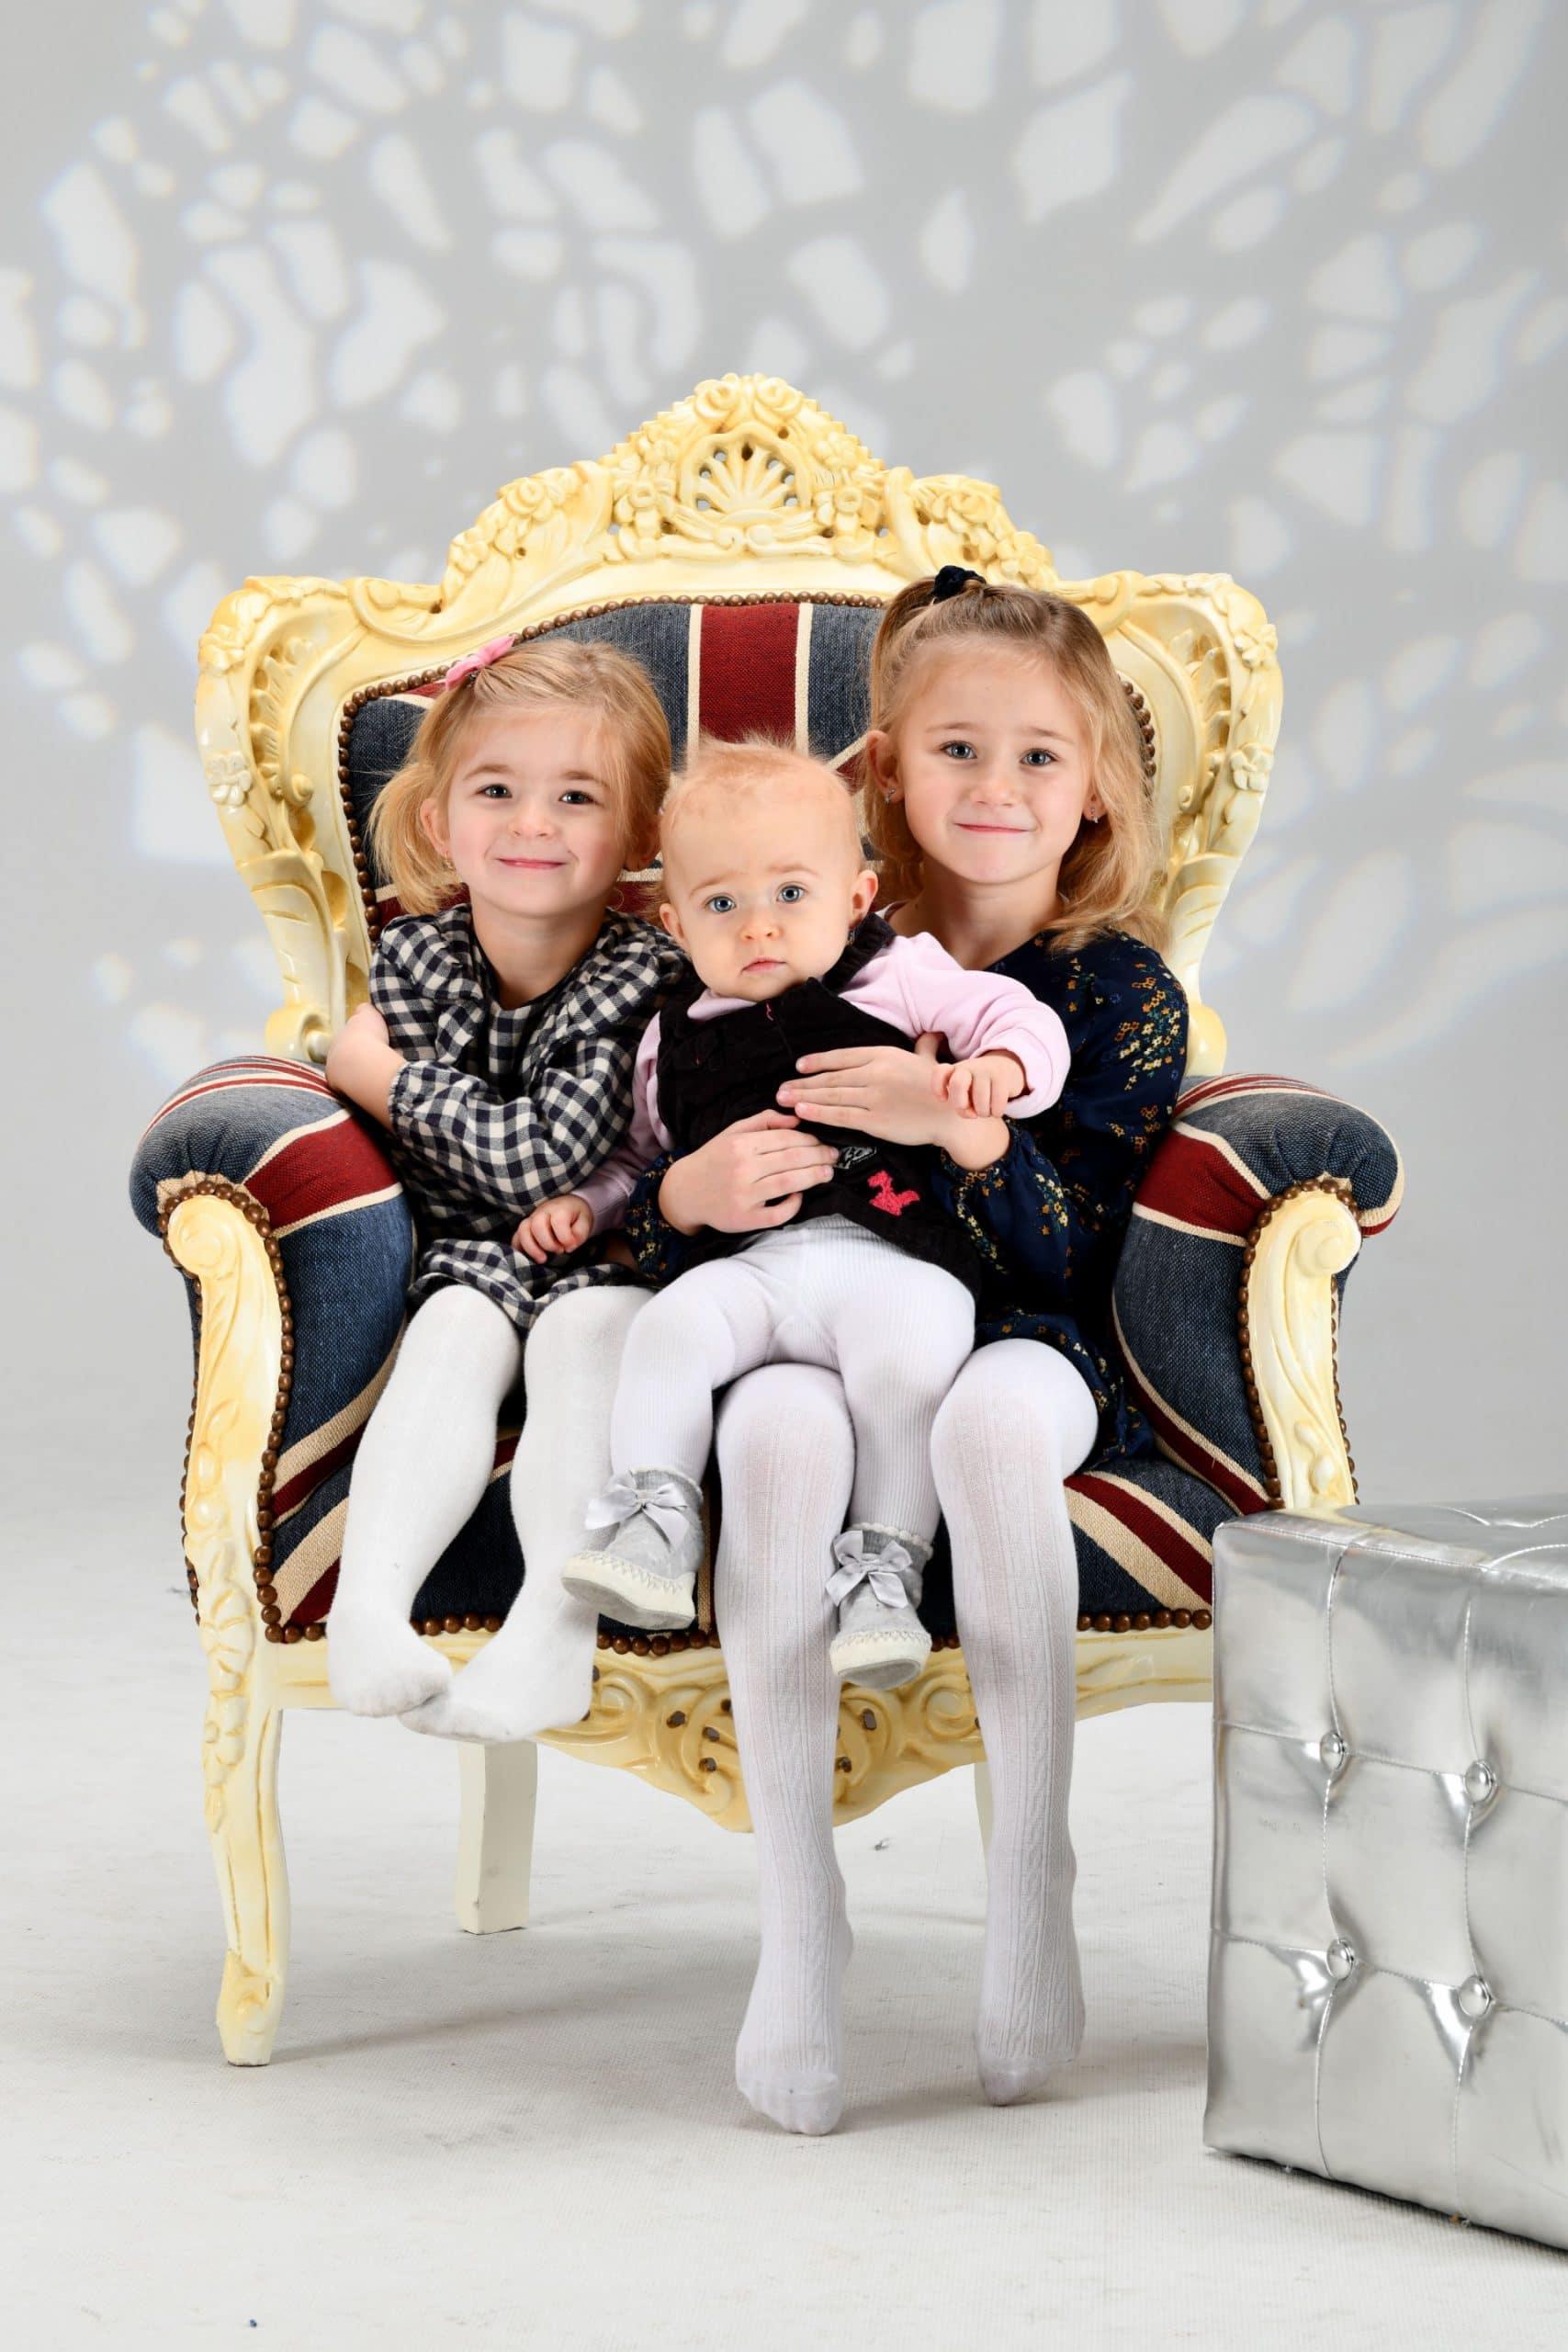 483-Schmitt-Photodesign-Kinderbilder-xCt3QaRz